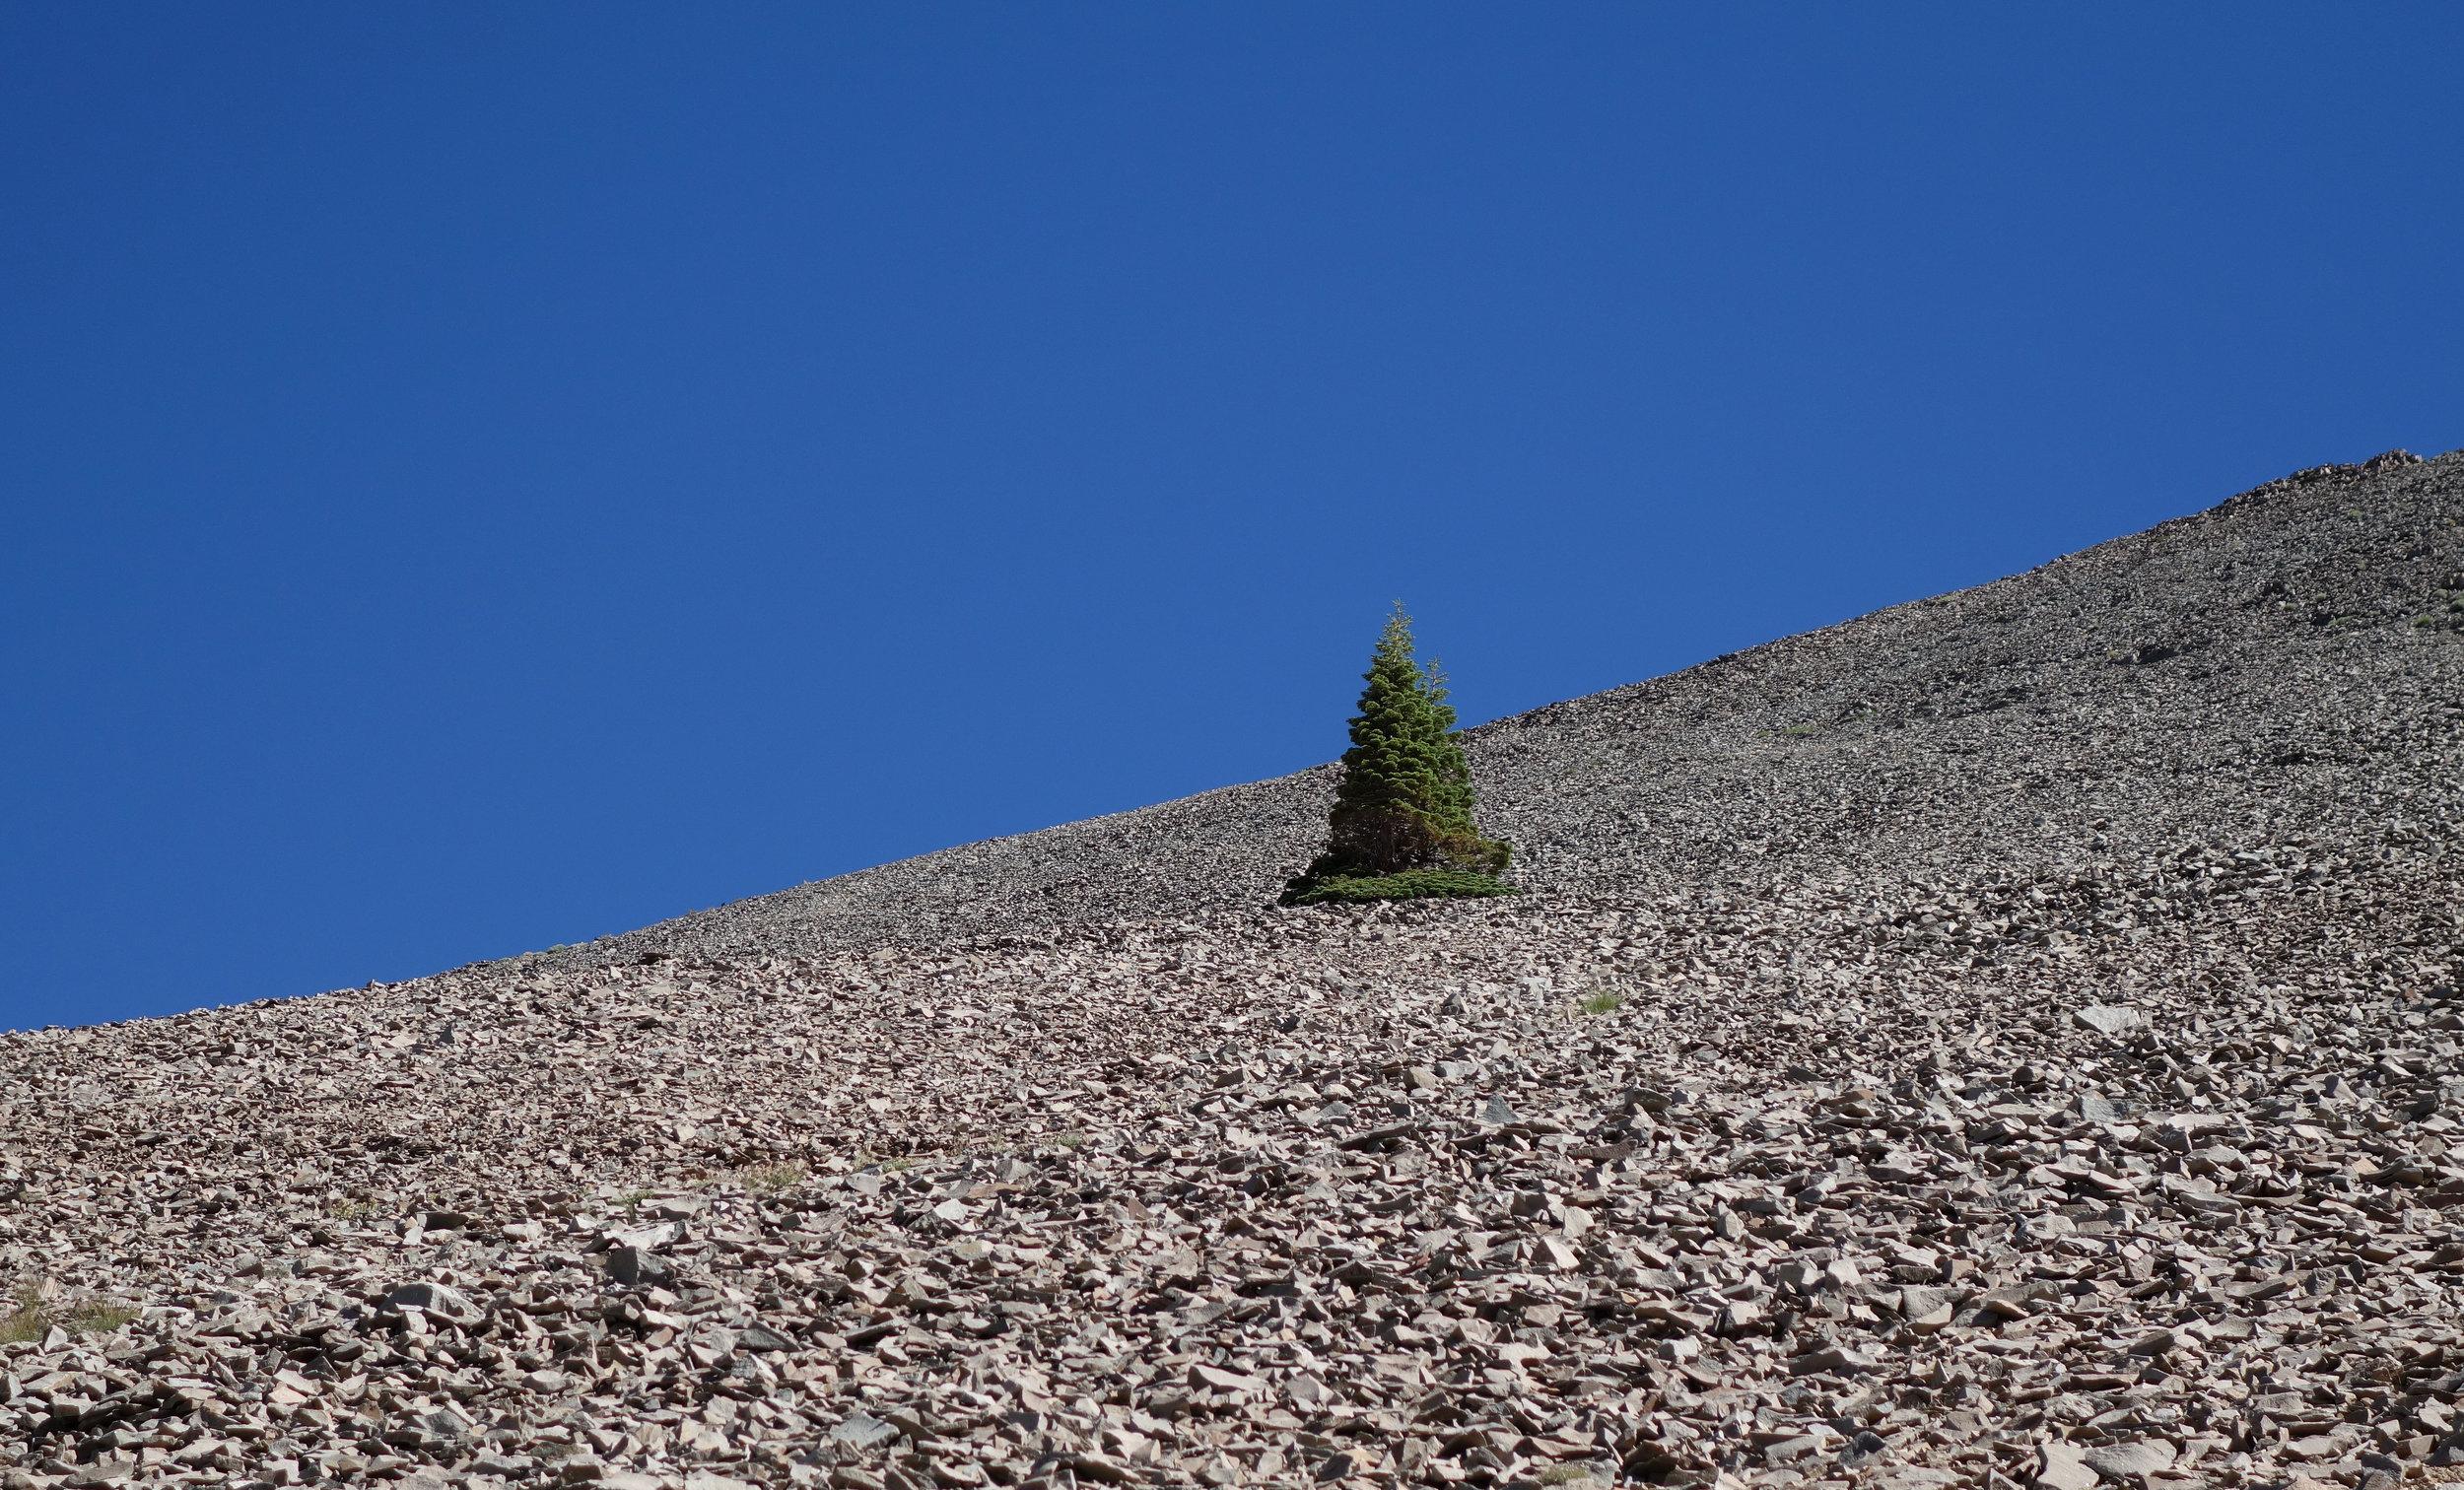 two trees on rocks.jpg